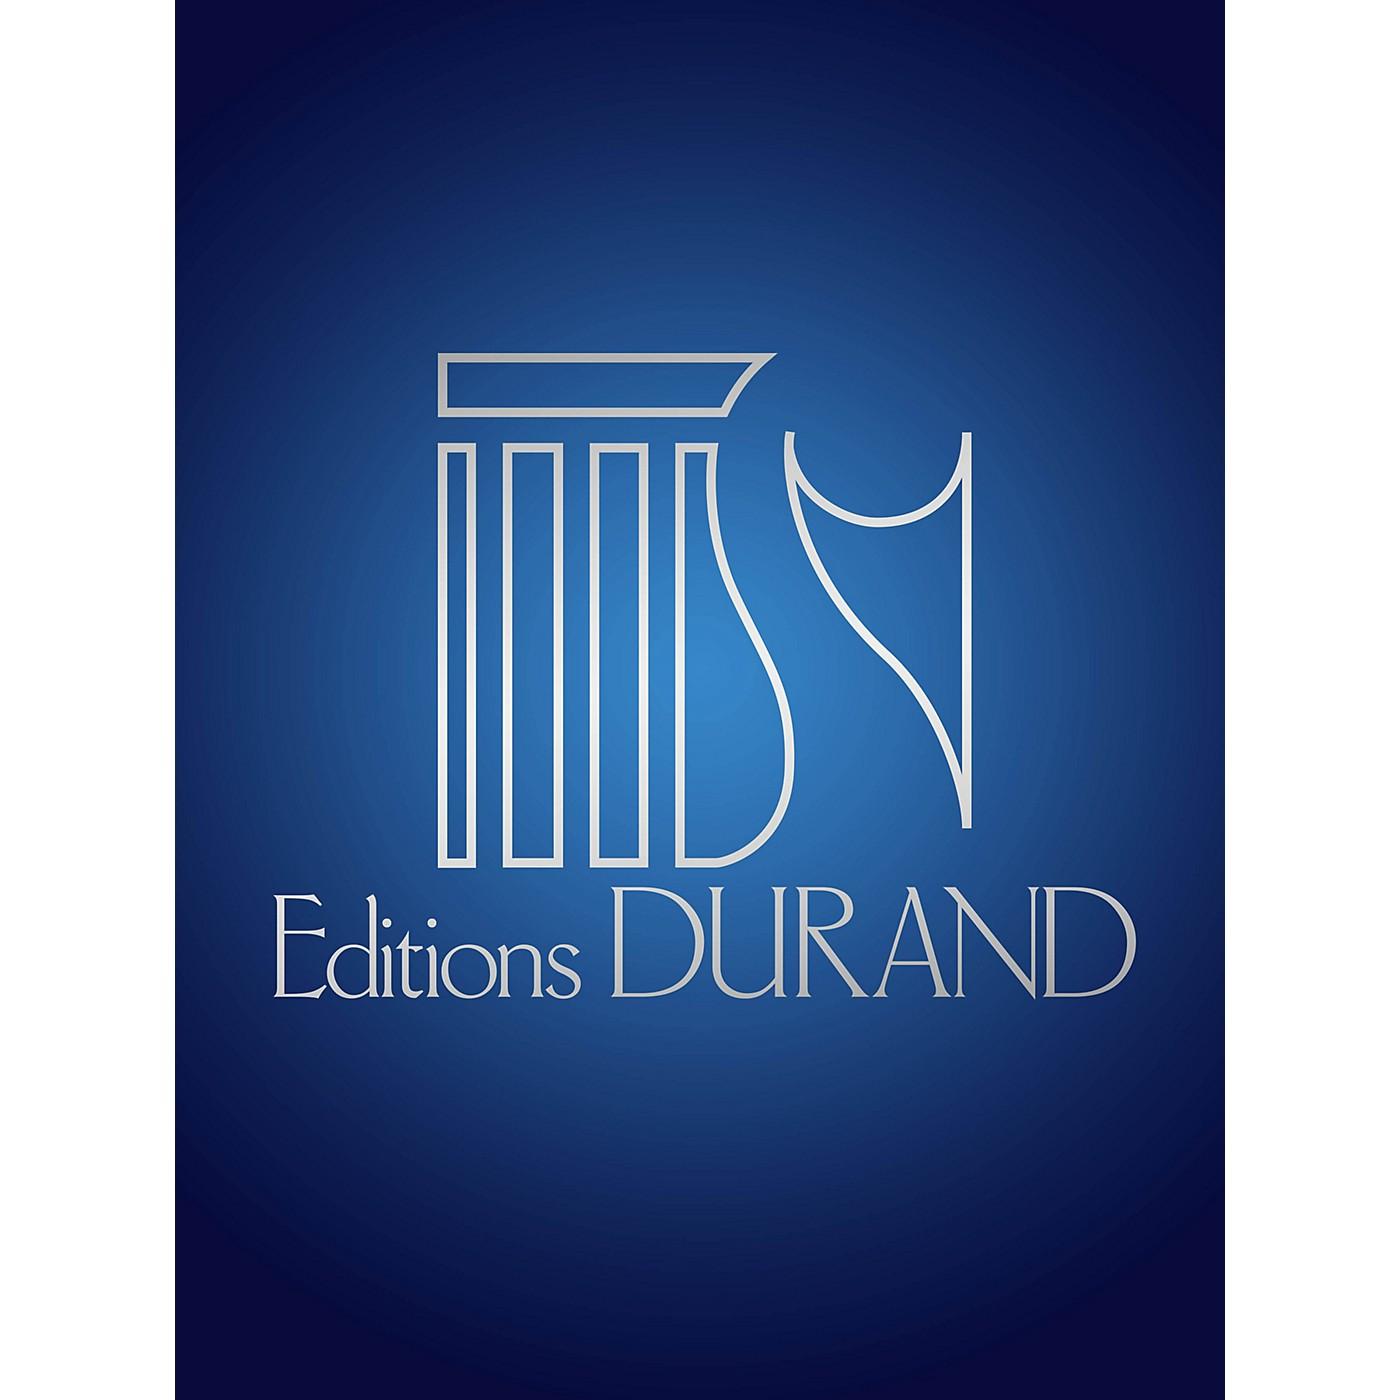 Hal Leonard Regina Coeli Choeur Hommes Male Chorus Parts thumbnail